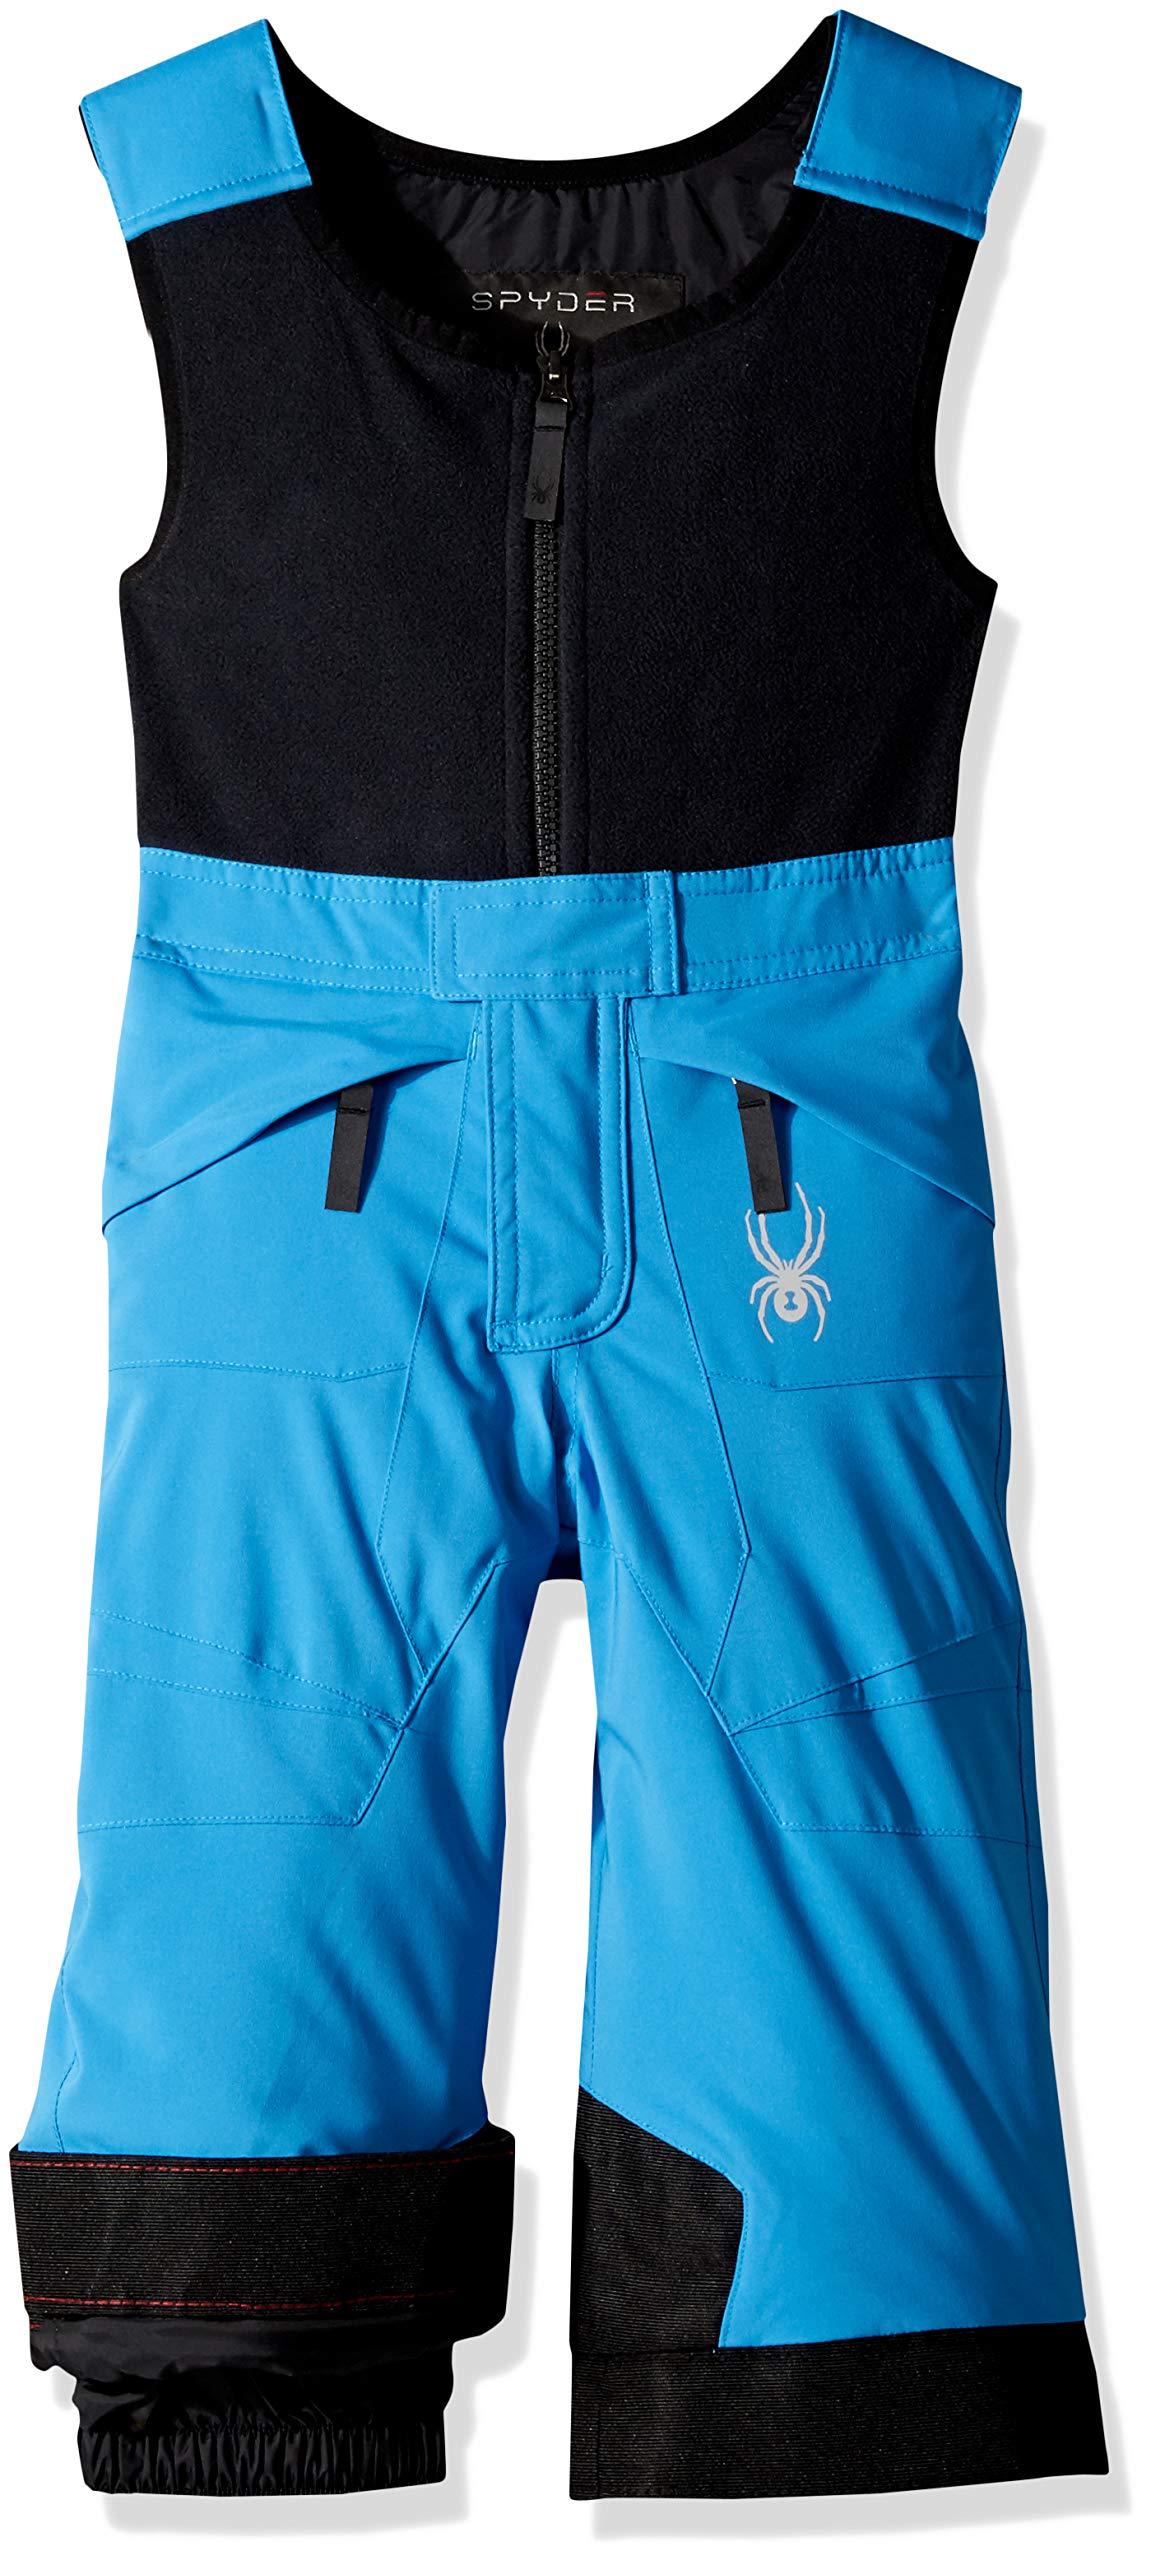 Spyder Boys' Mini Expedition Ski Pant, French Blue/Black/Black, Size 2